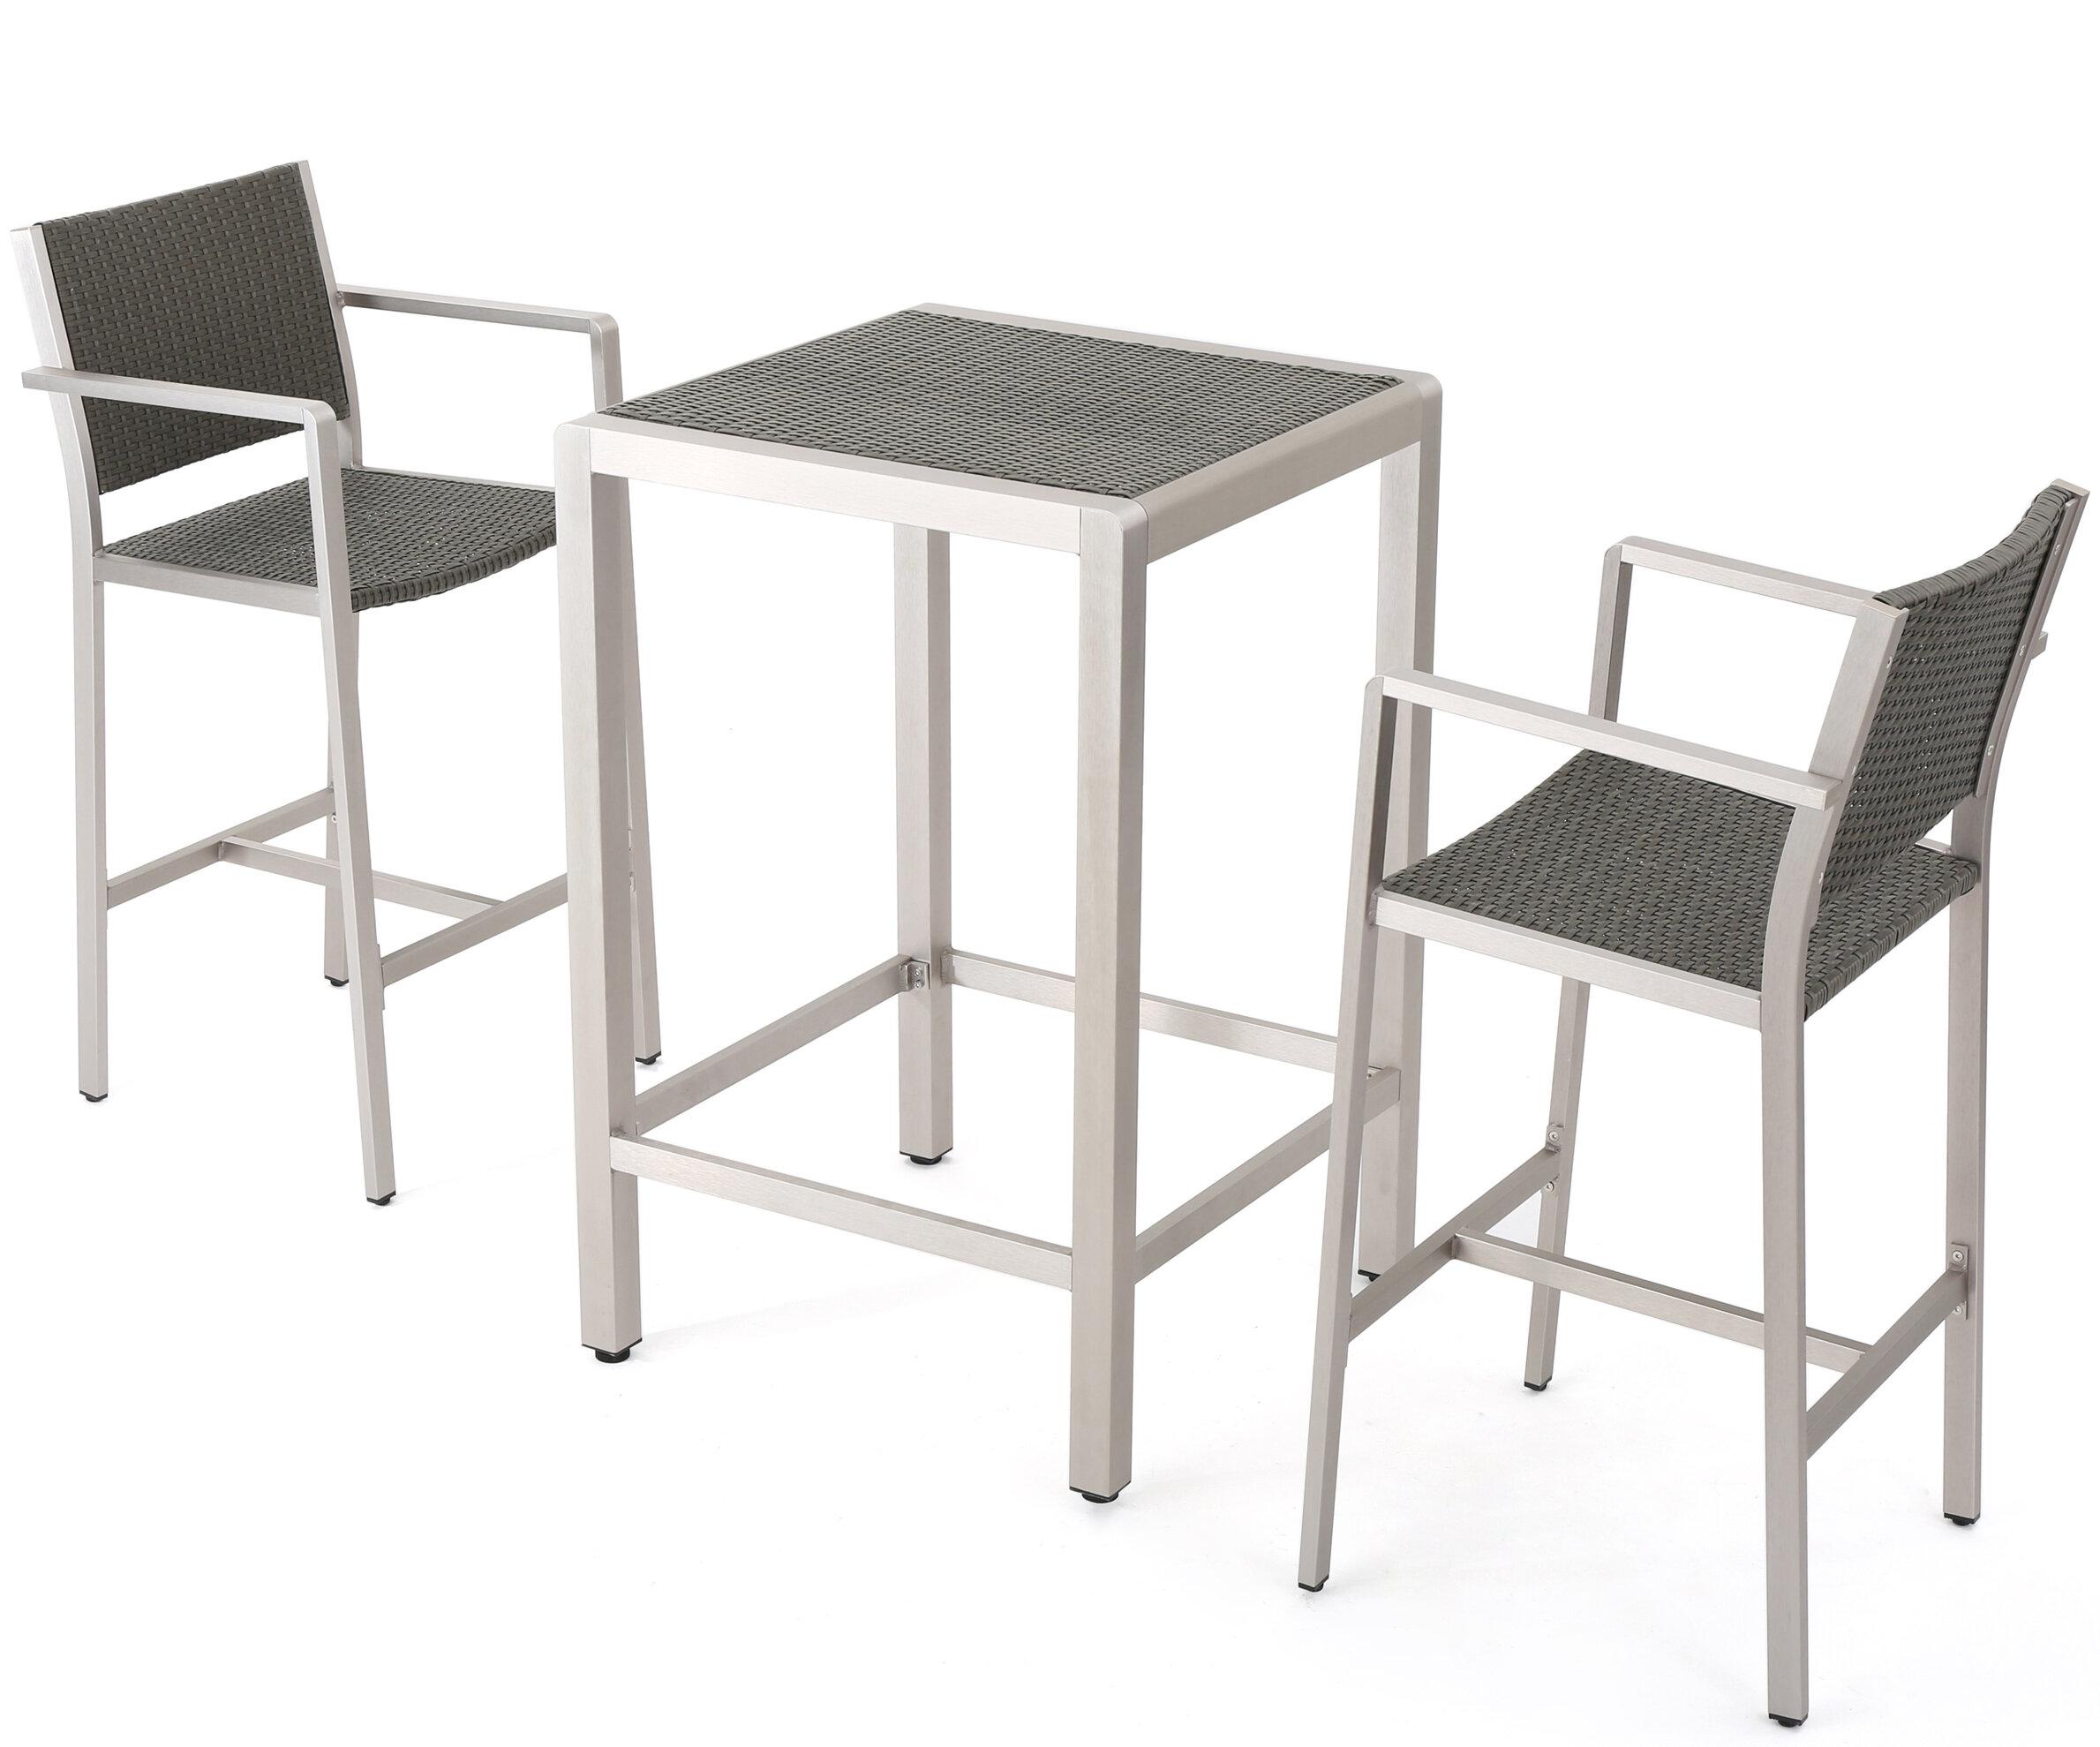 Swell Royalston 3 Piece Bar Height Dining Set Download Free Architecture Designs Intelgarnamadebymaigaardcom